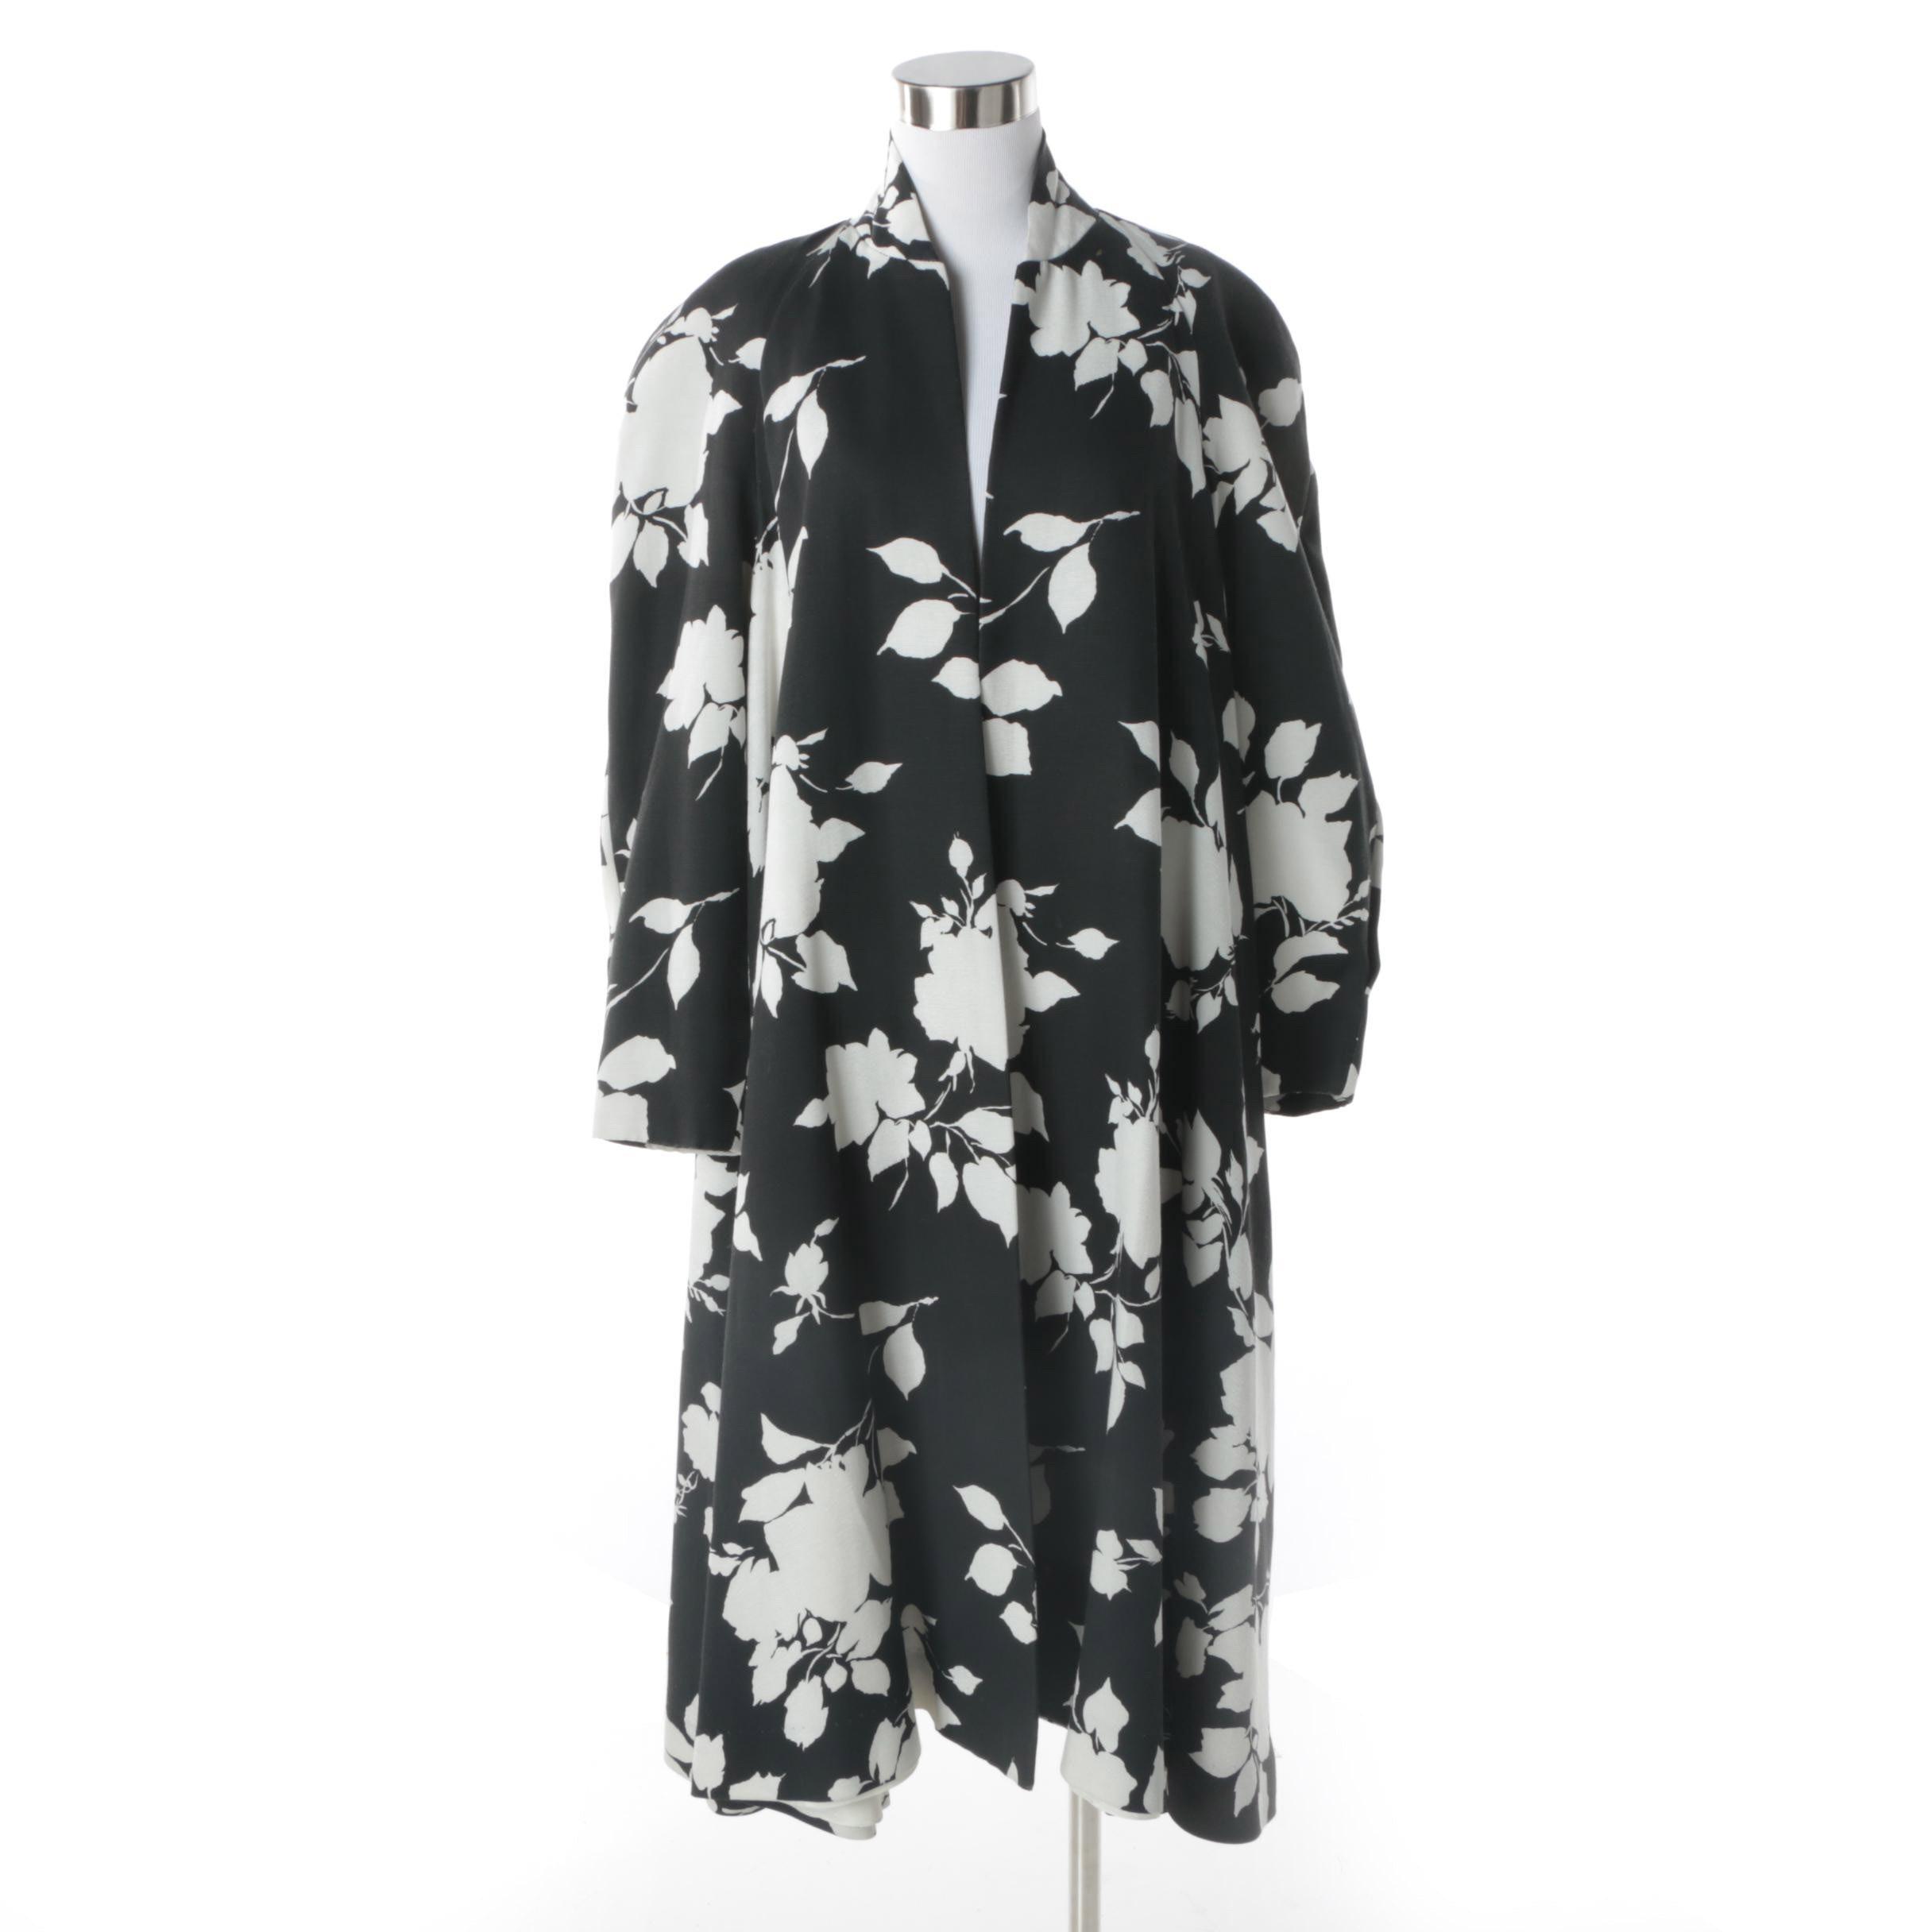 Women's Circa 1980s Victor Costa Black and White Floral Print Opera Coat